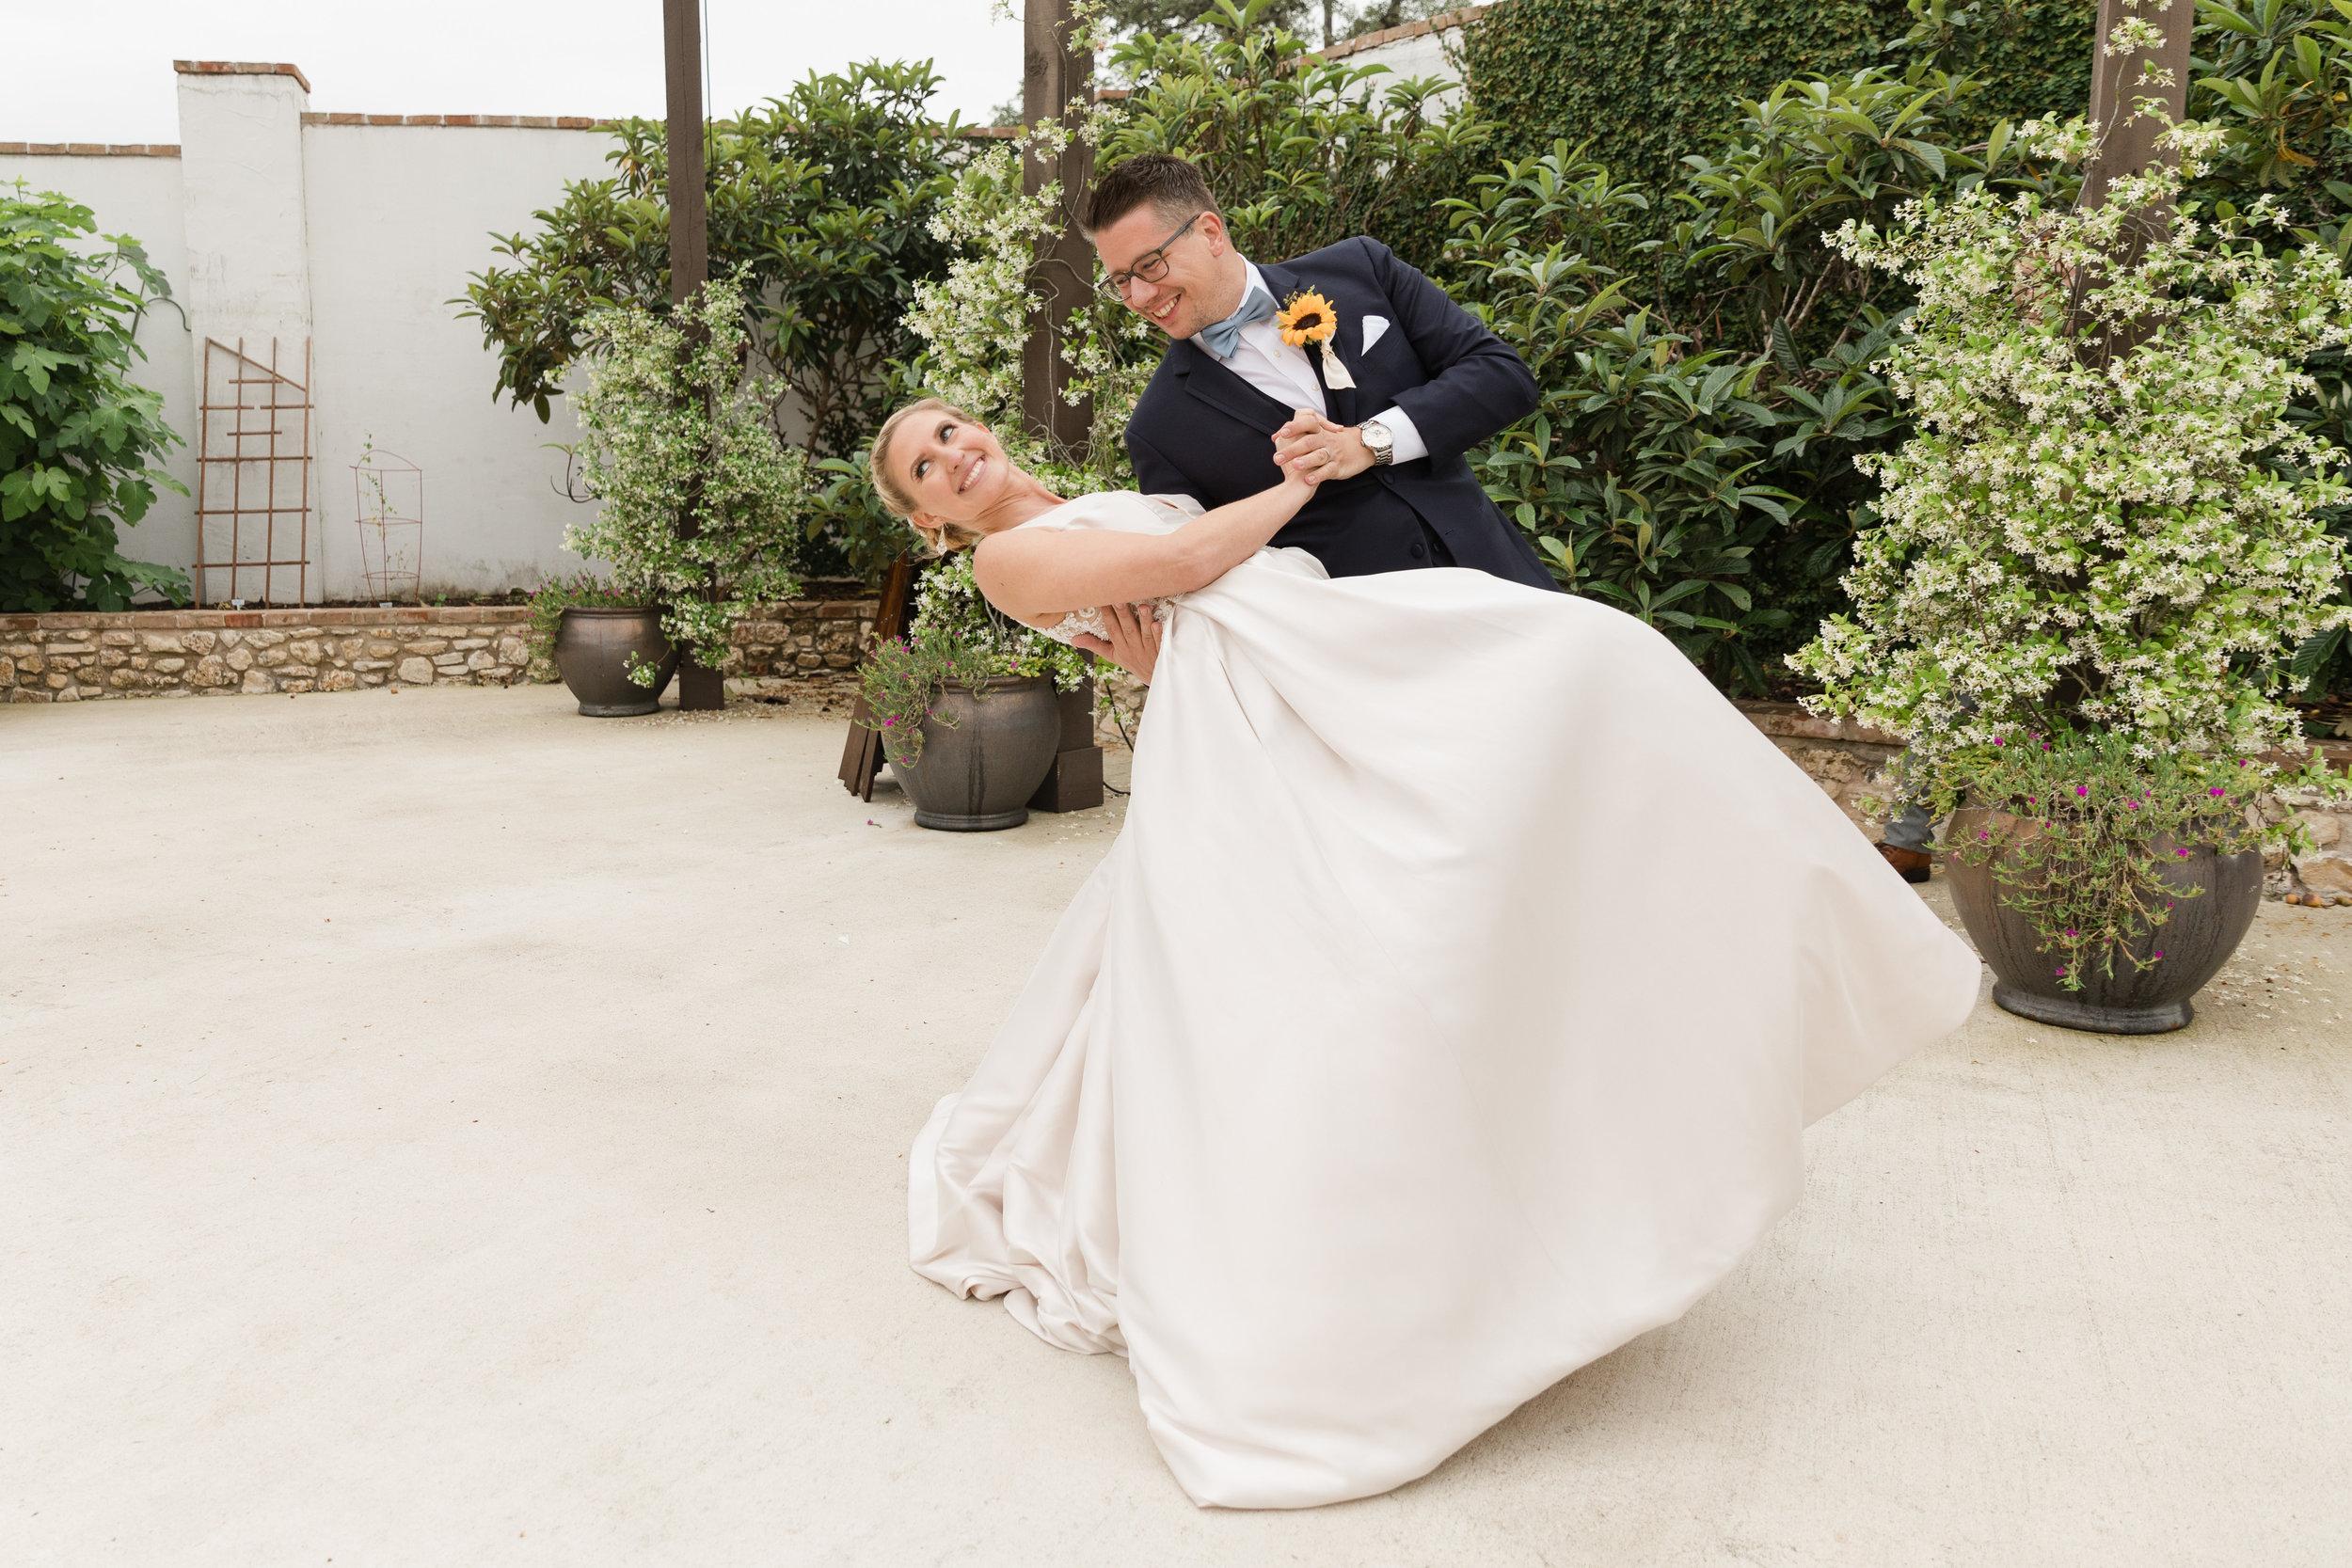 Laufs-Wedding-686.jpg